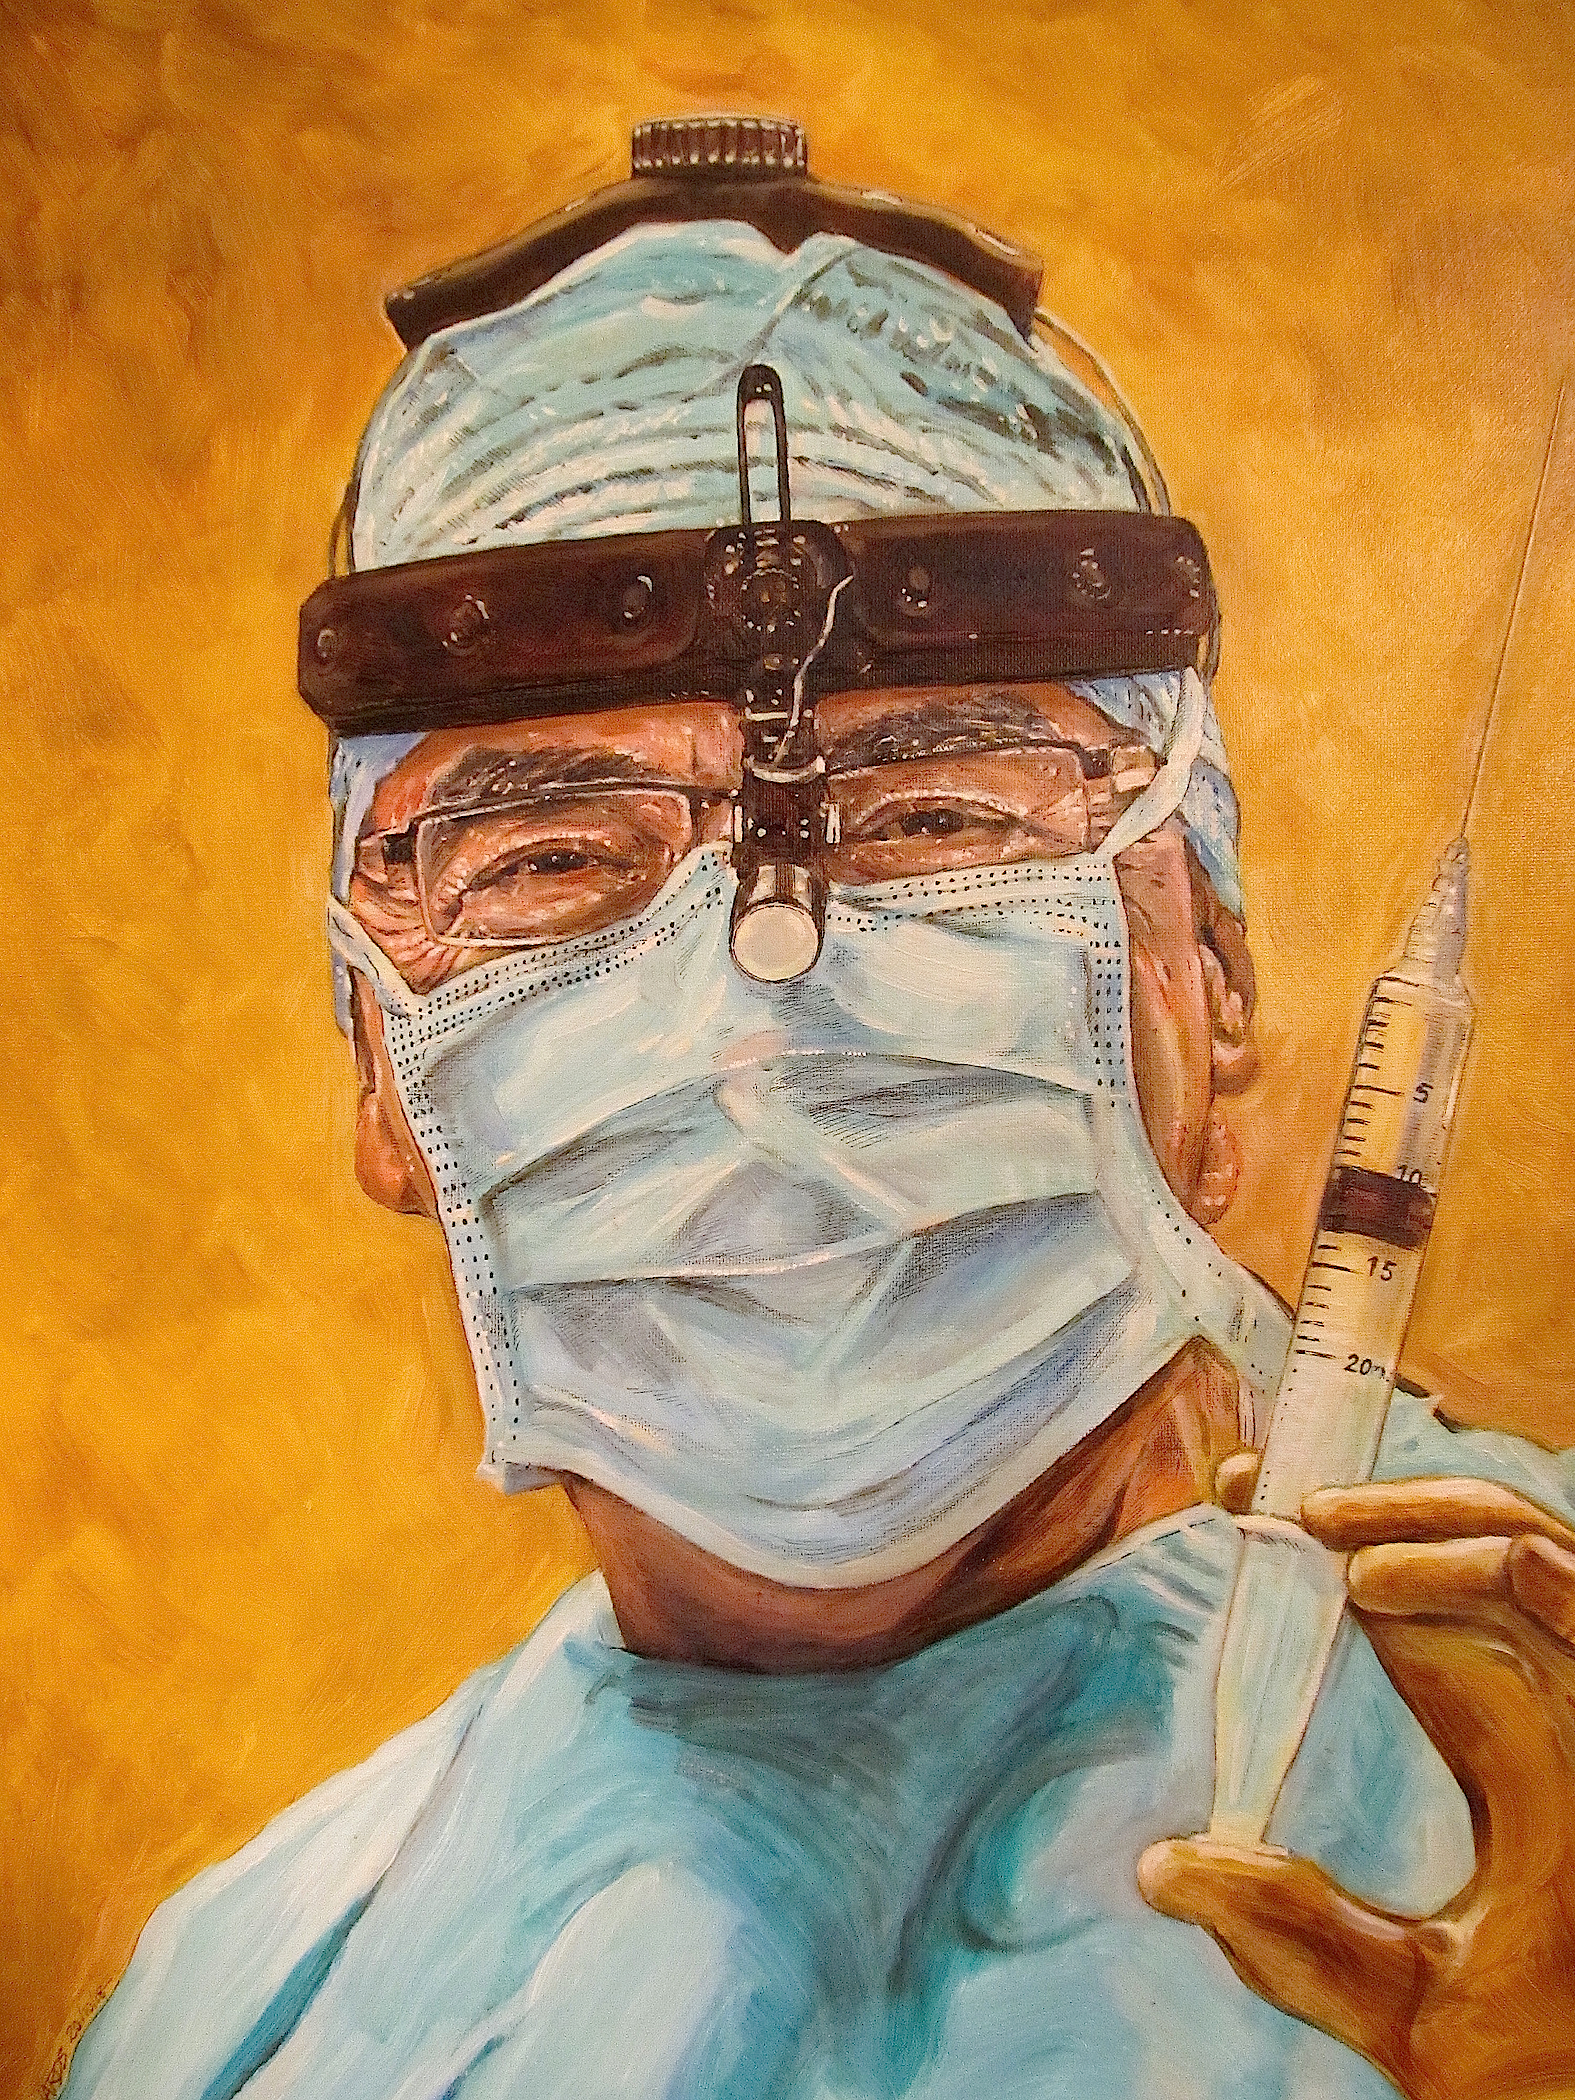 Dr. Gordon Wilkes